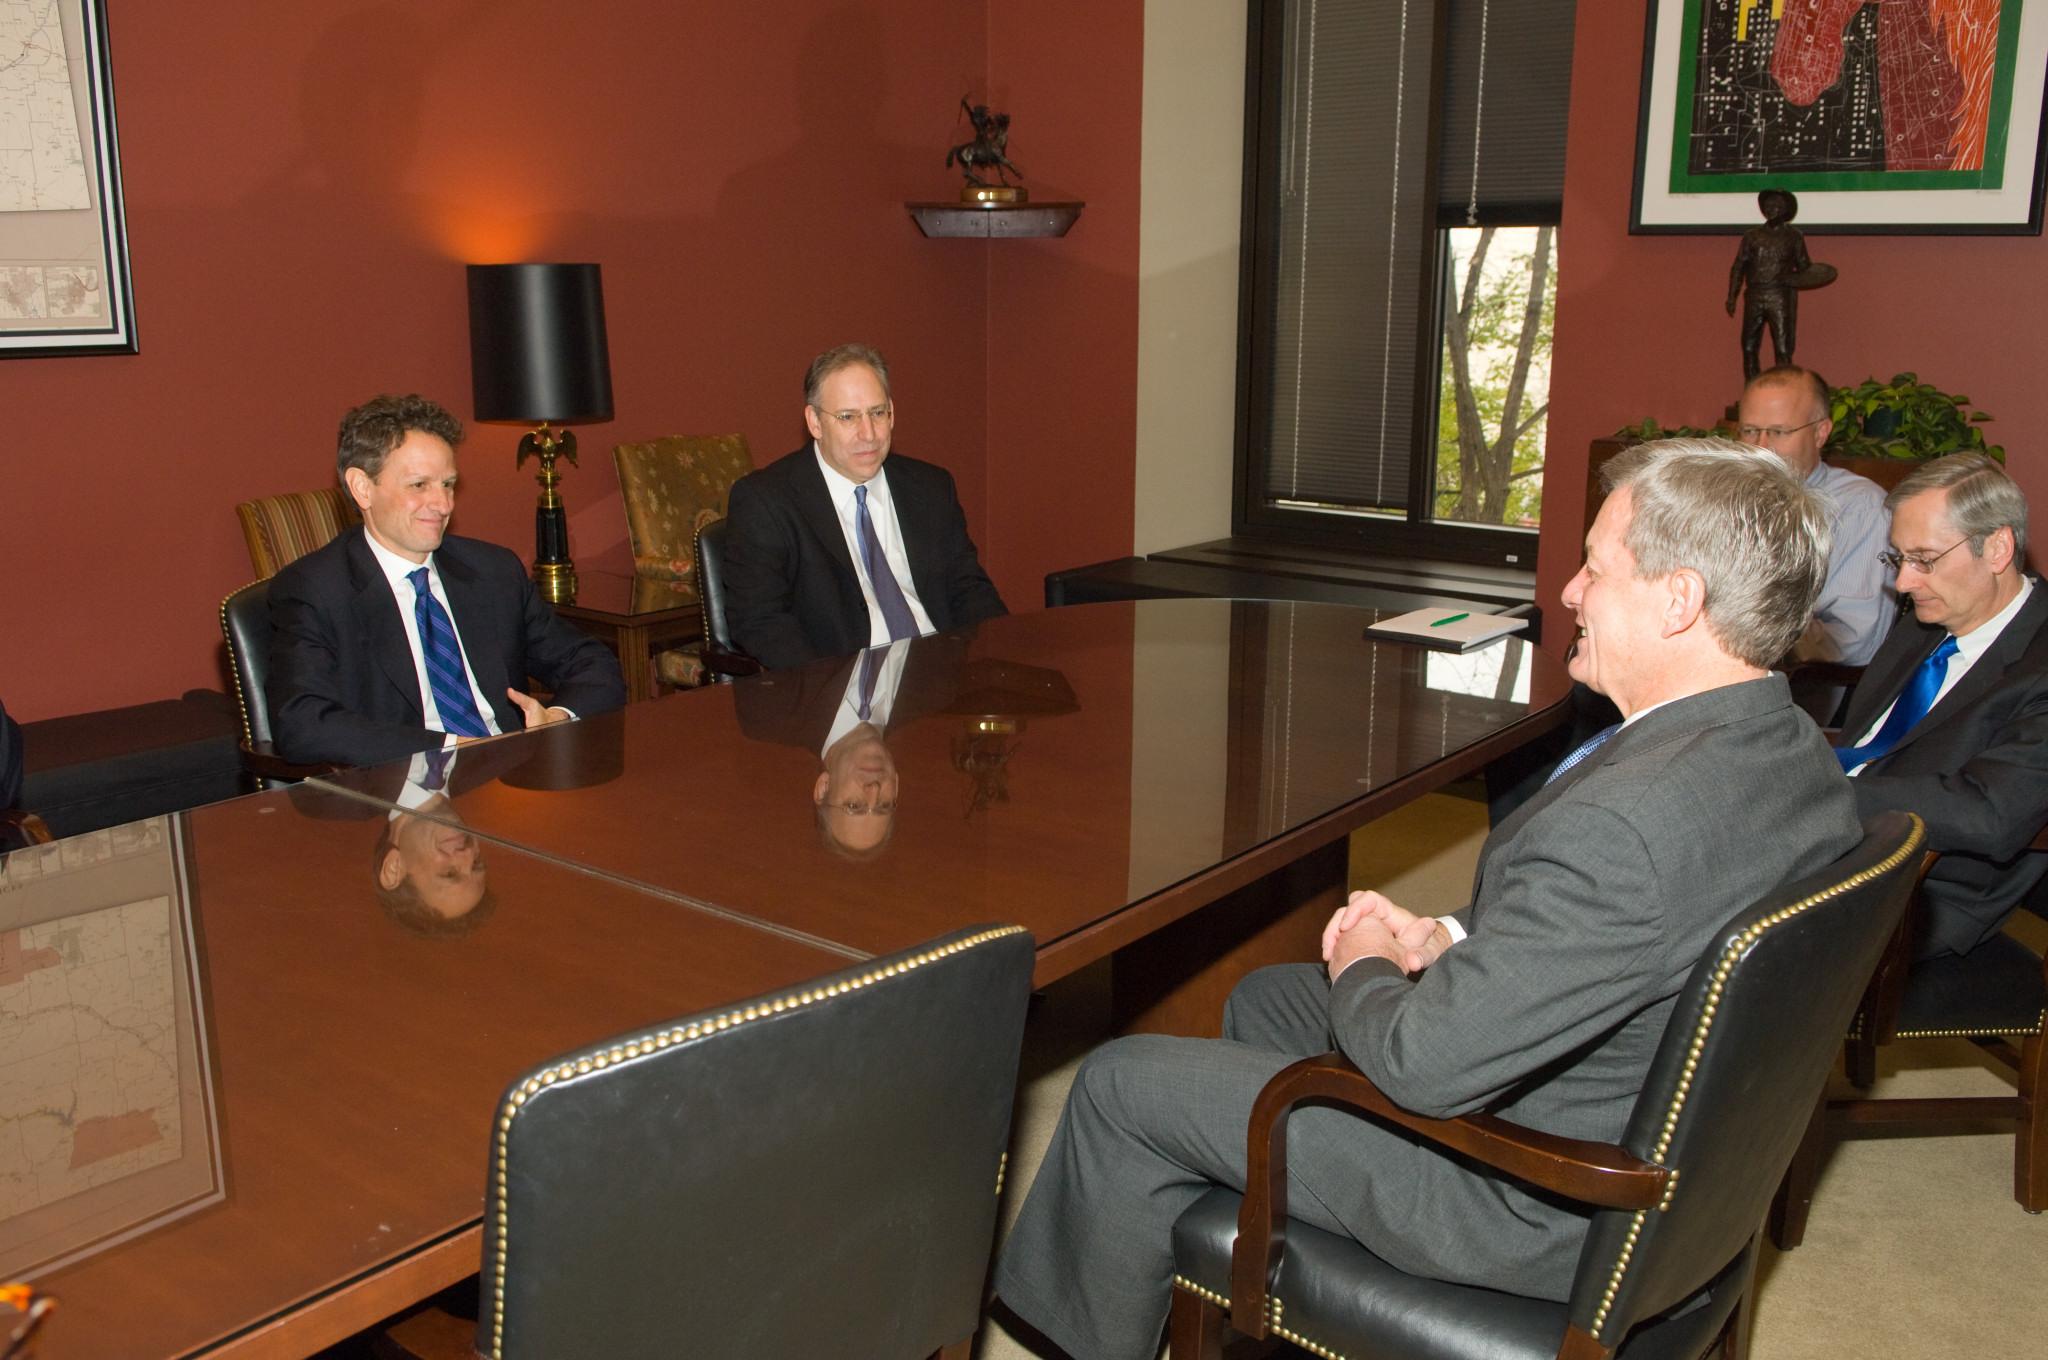 Treasury Secretary designee Geithner meets then-Finance Committee Chairman Max Baucus on November 25, 2008